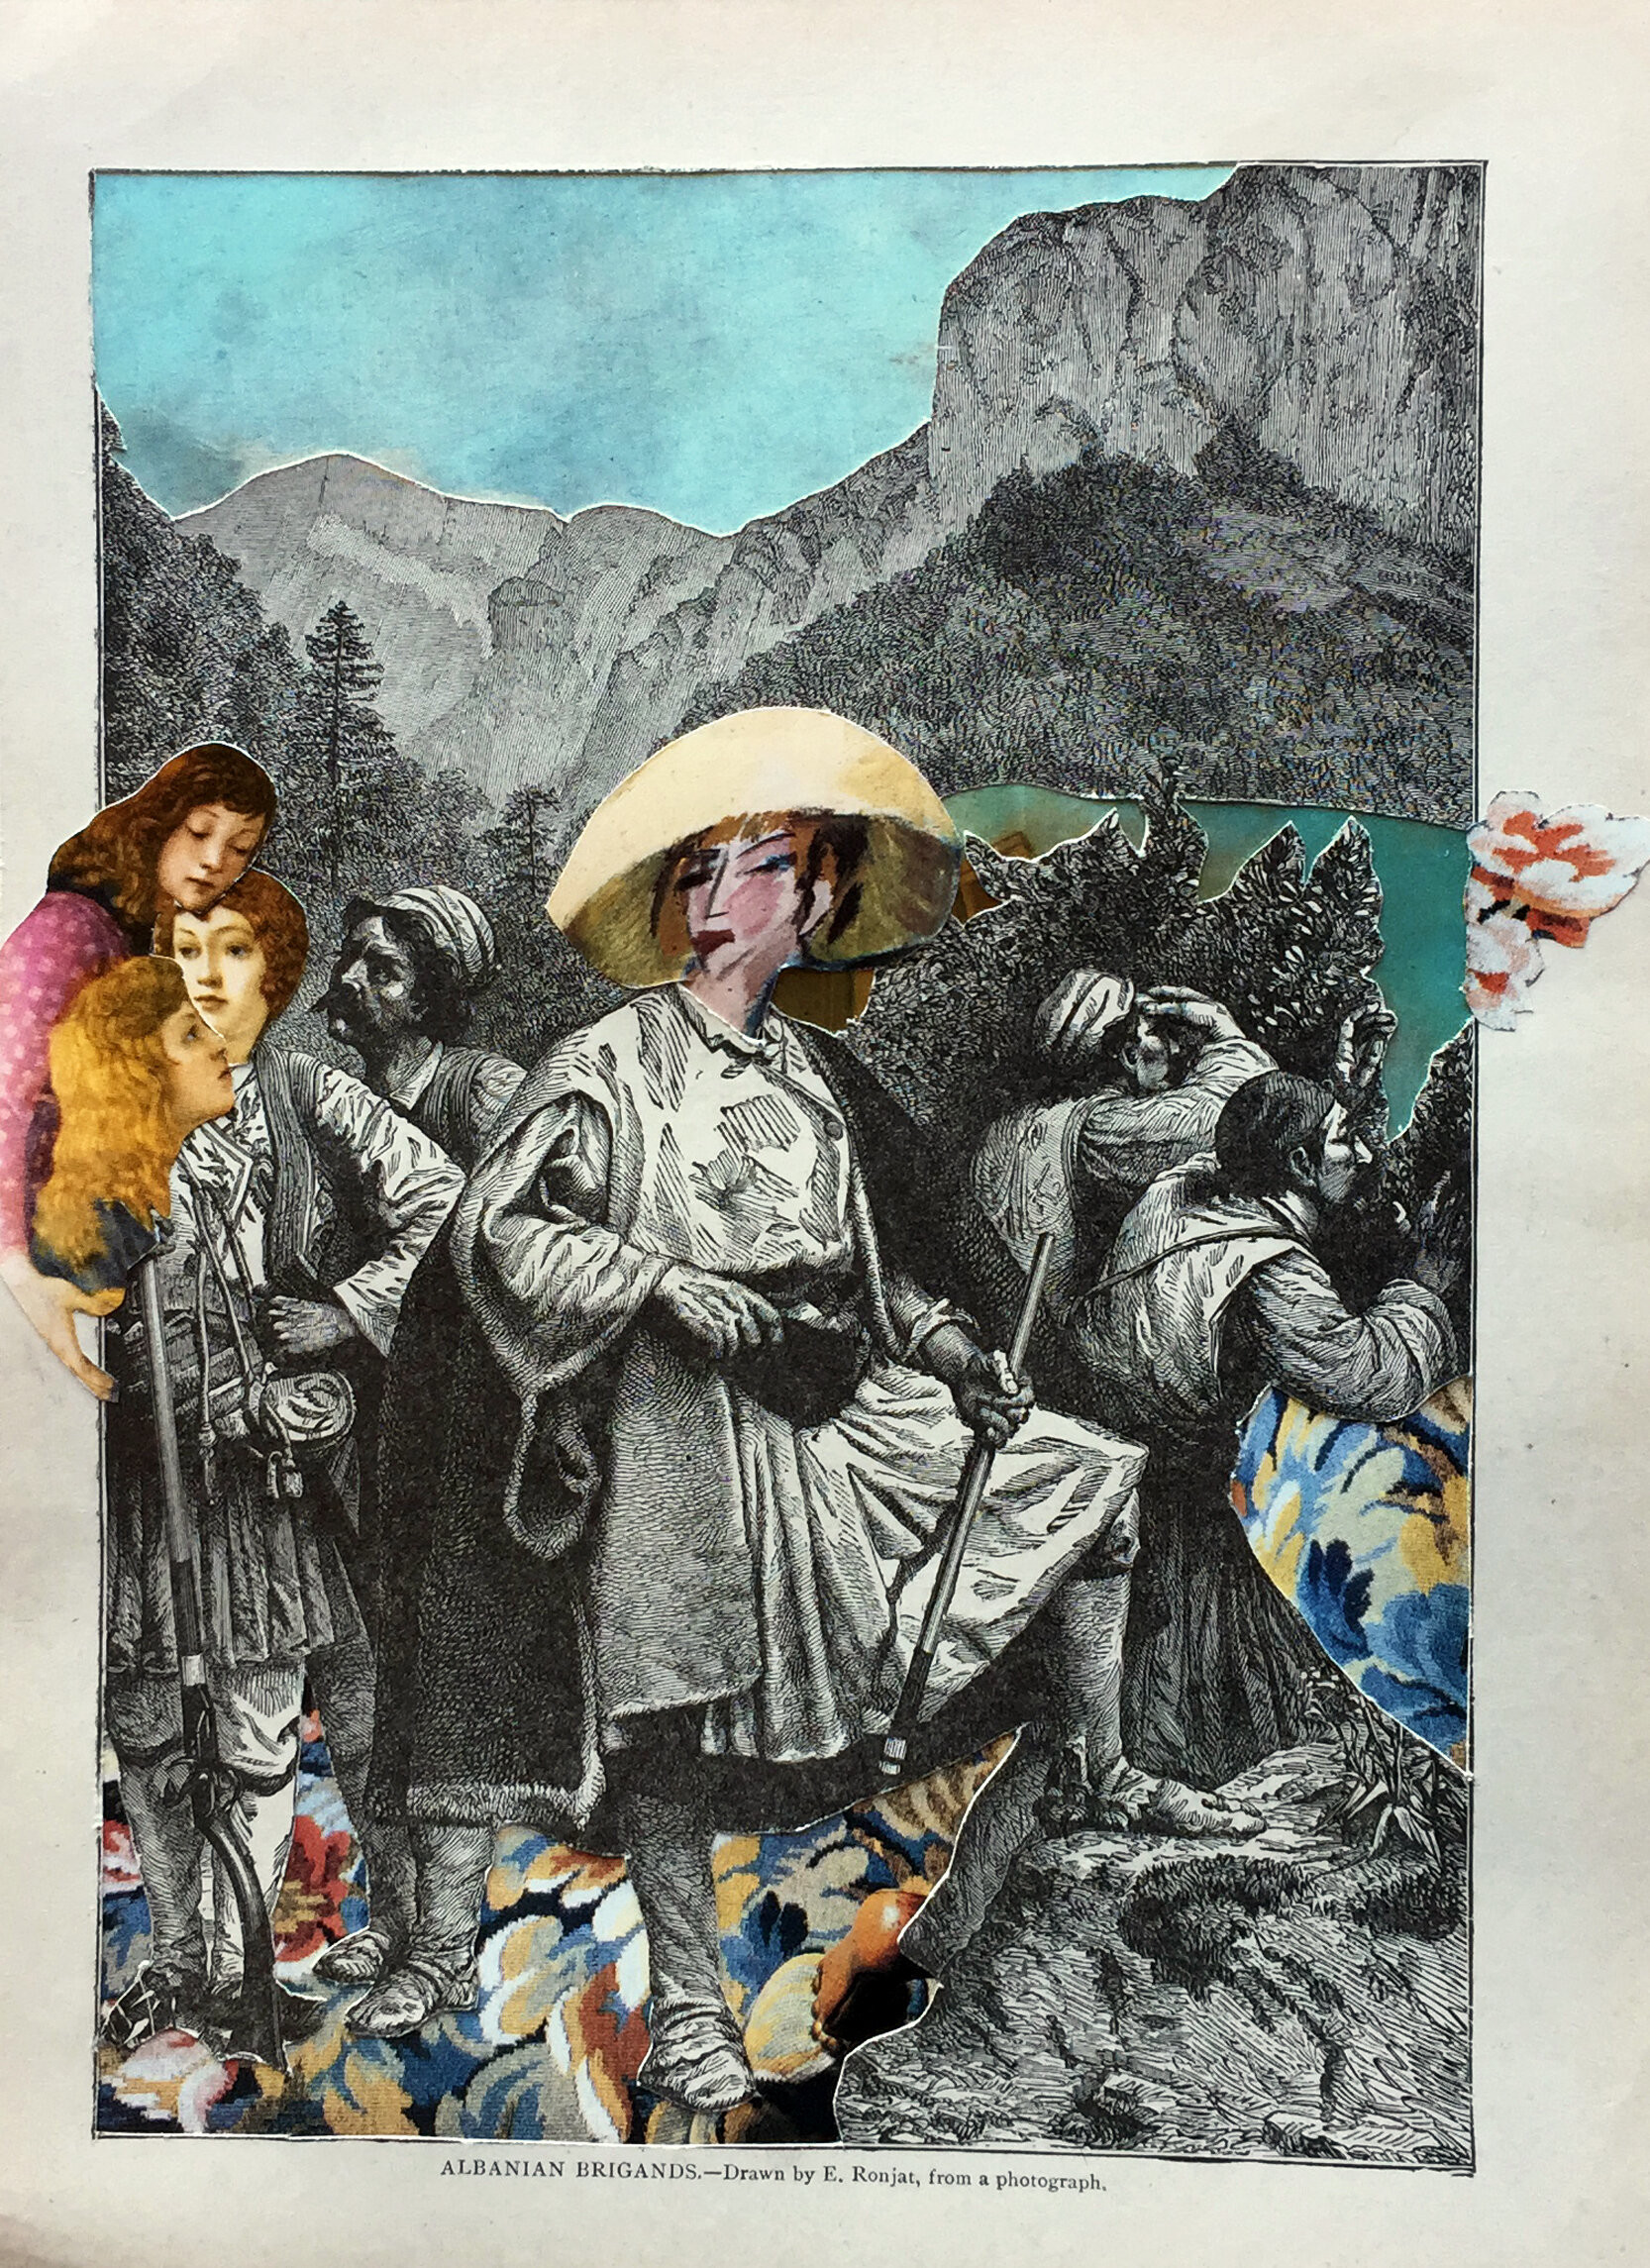 Conspirar, collage análogo 21 x 29 cm - Florencia Reid